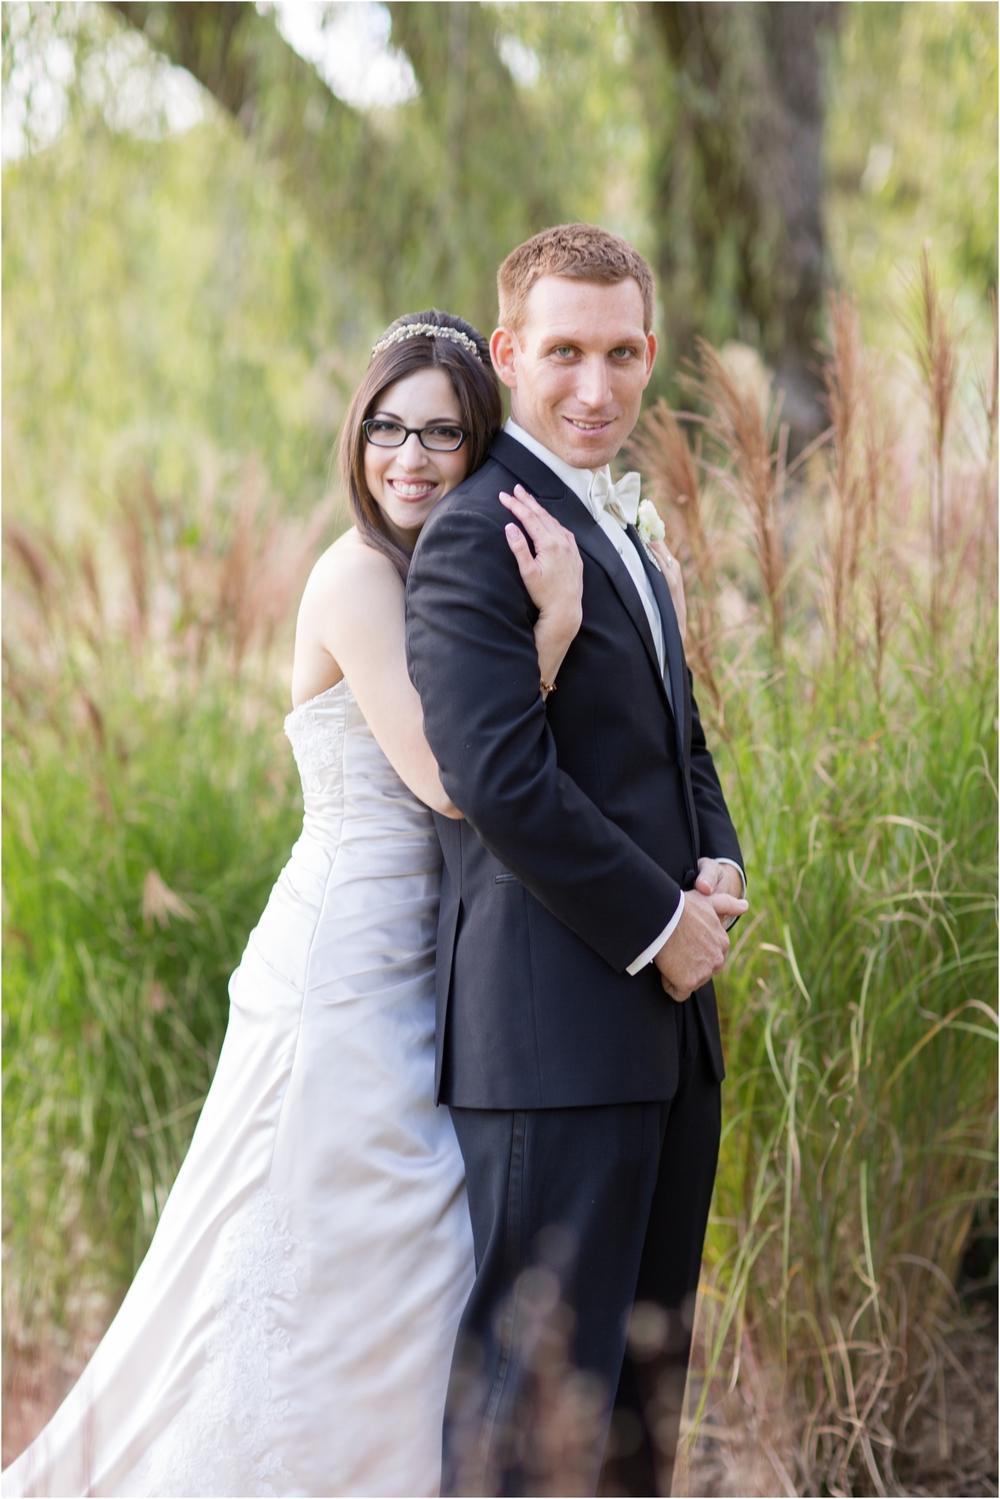 Elhai-Wedding-3-Bride-and-Groom-513.jpg